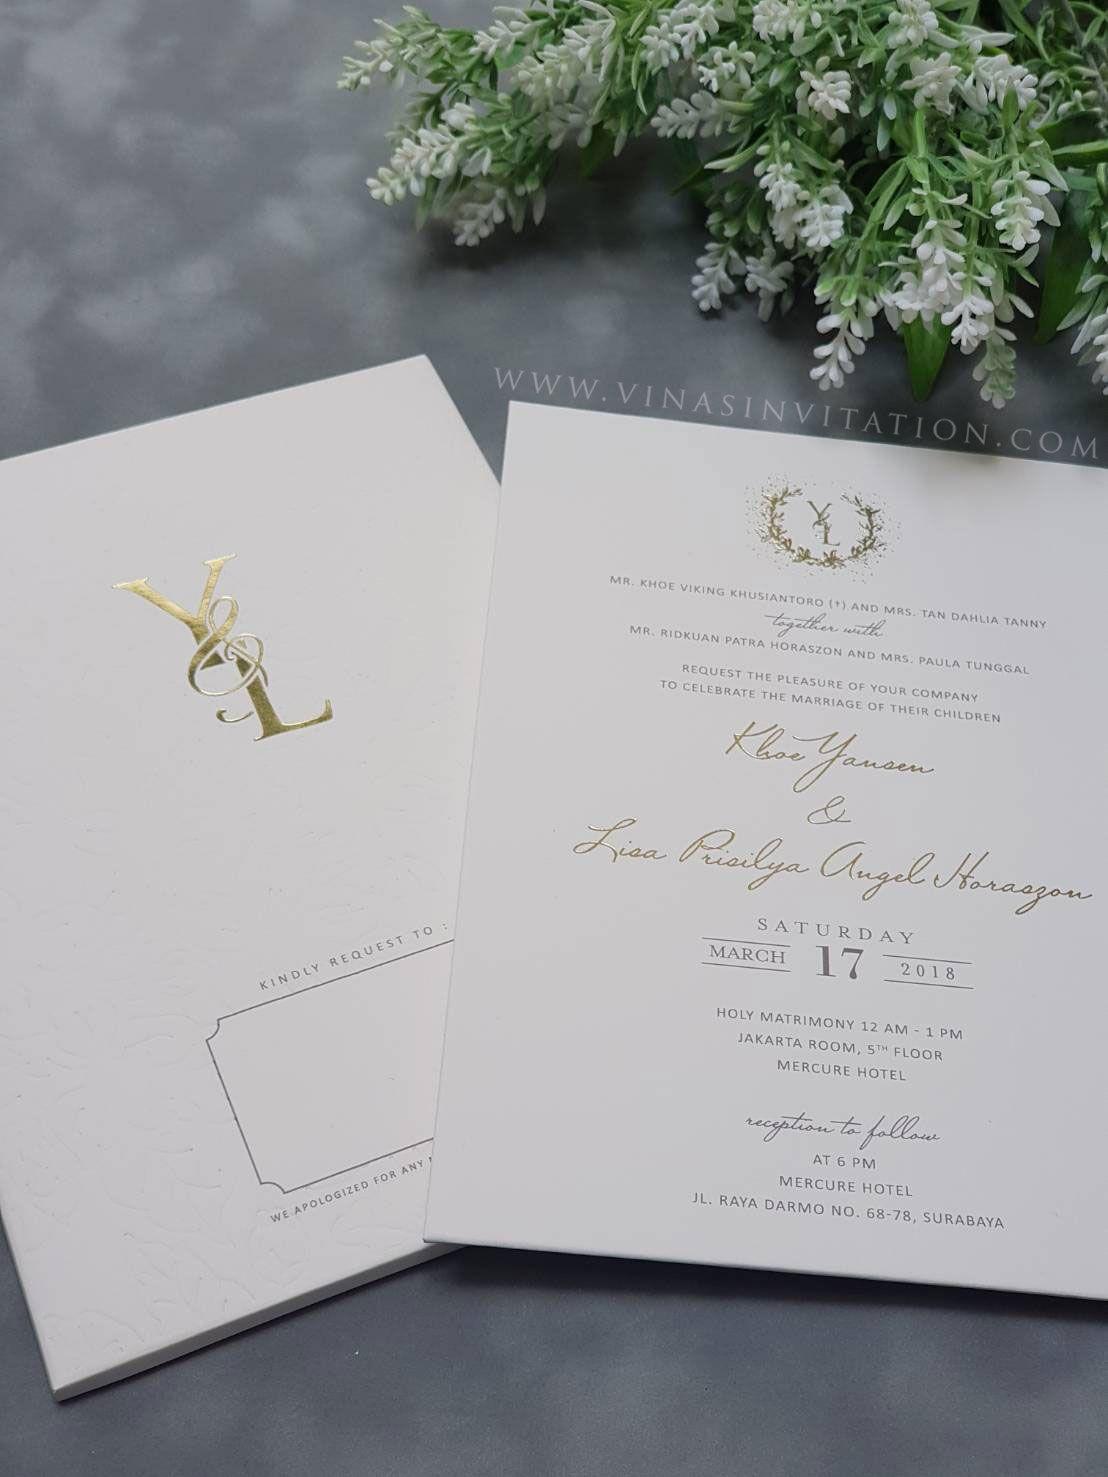 Vinas Invitation Sydney Wedding Invitation Indonesia Wedding